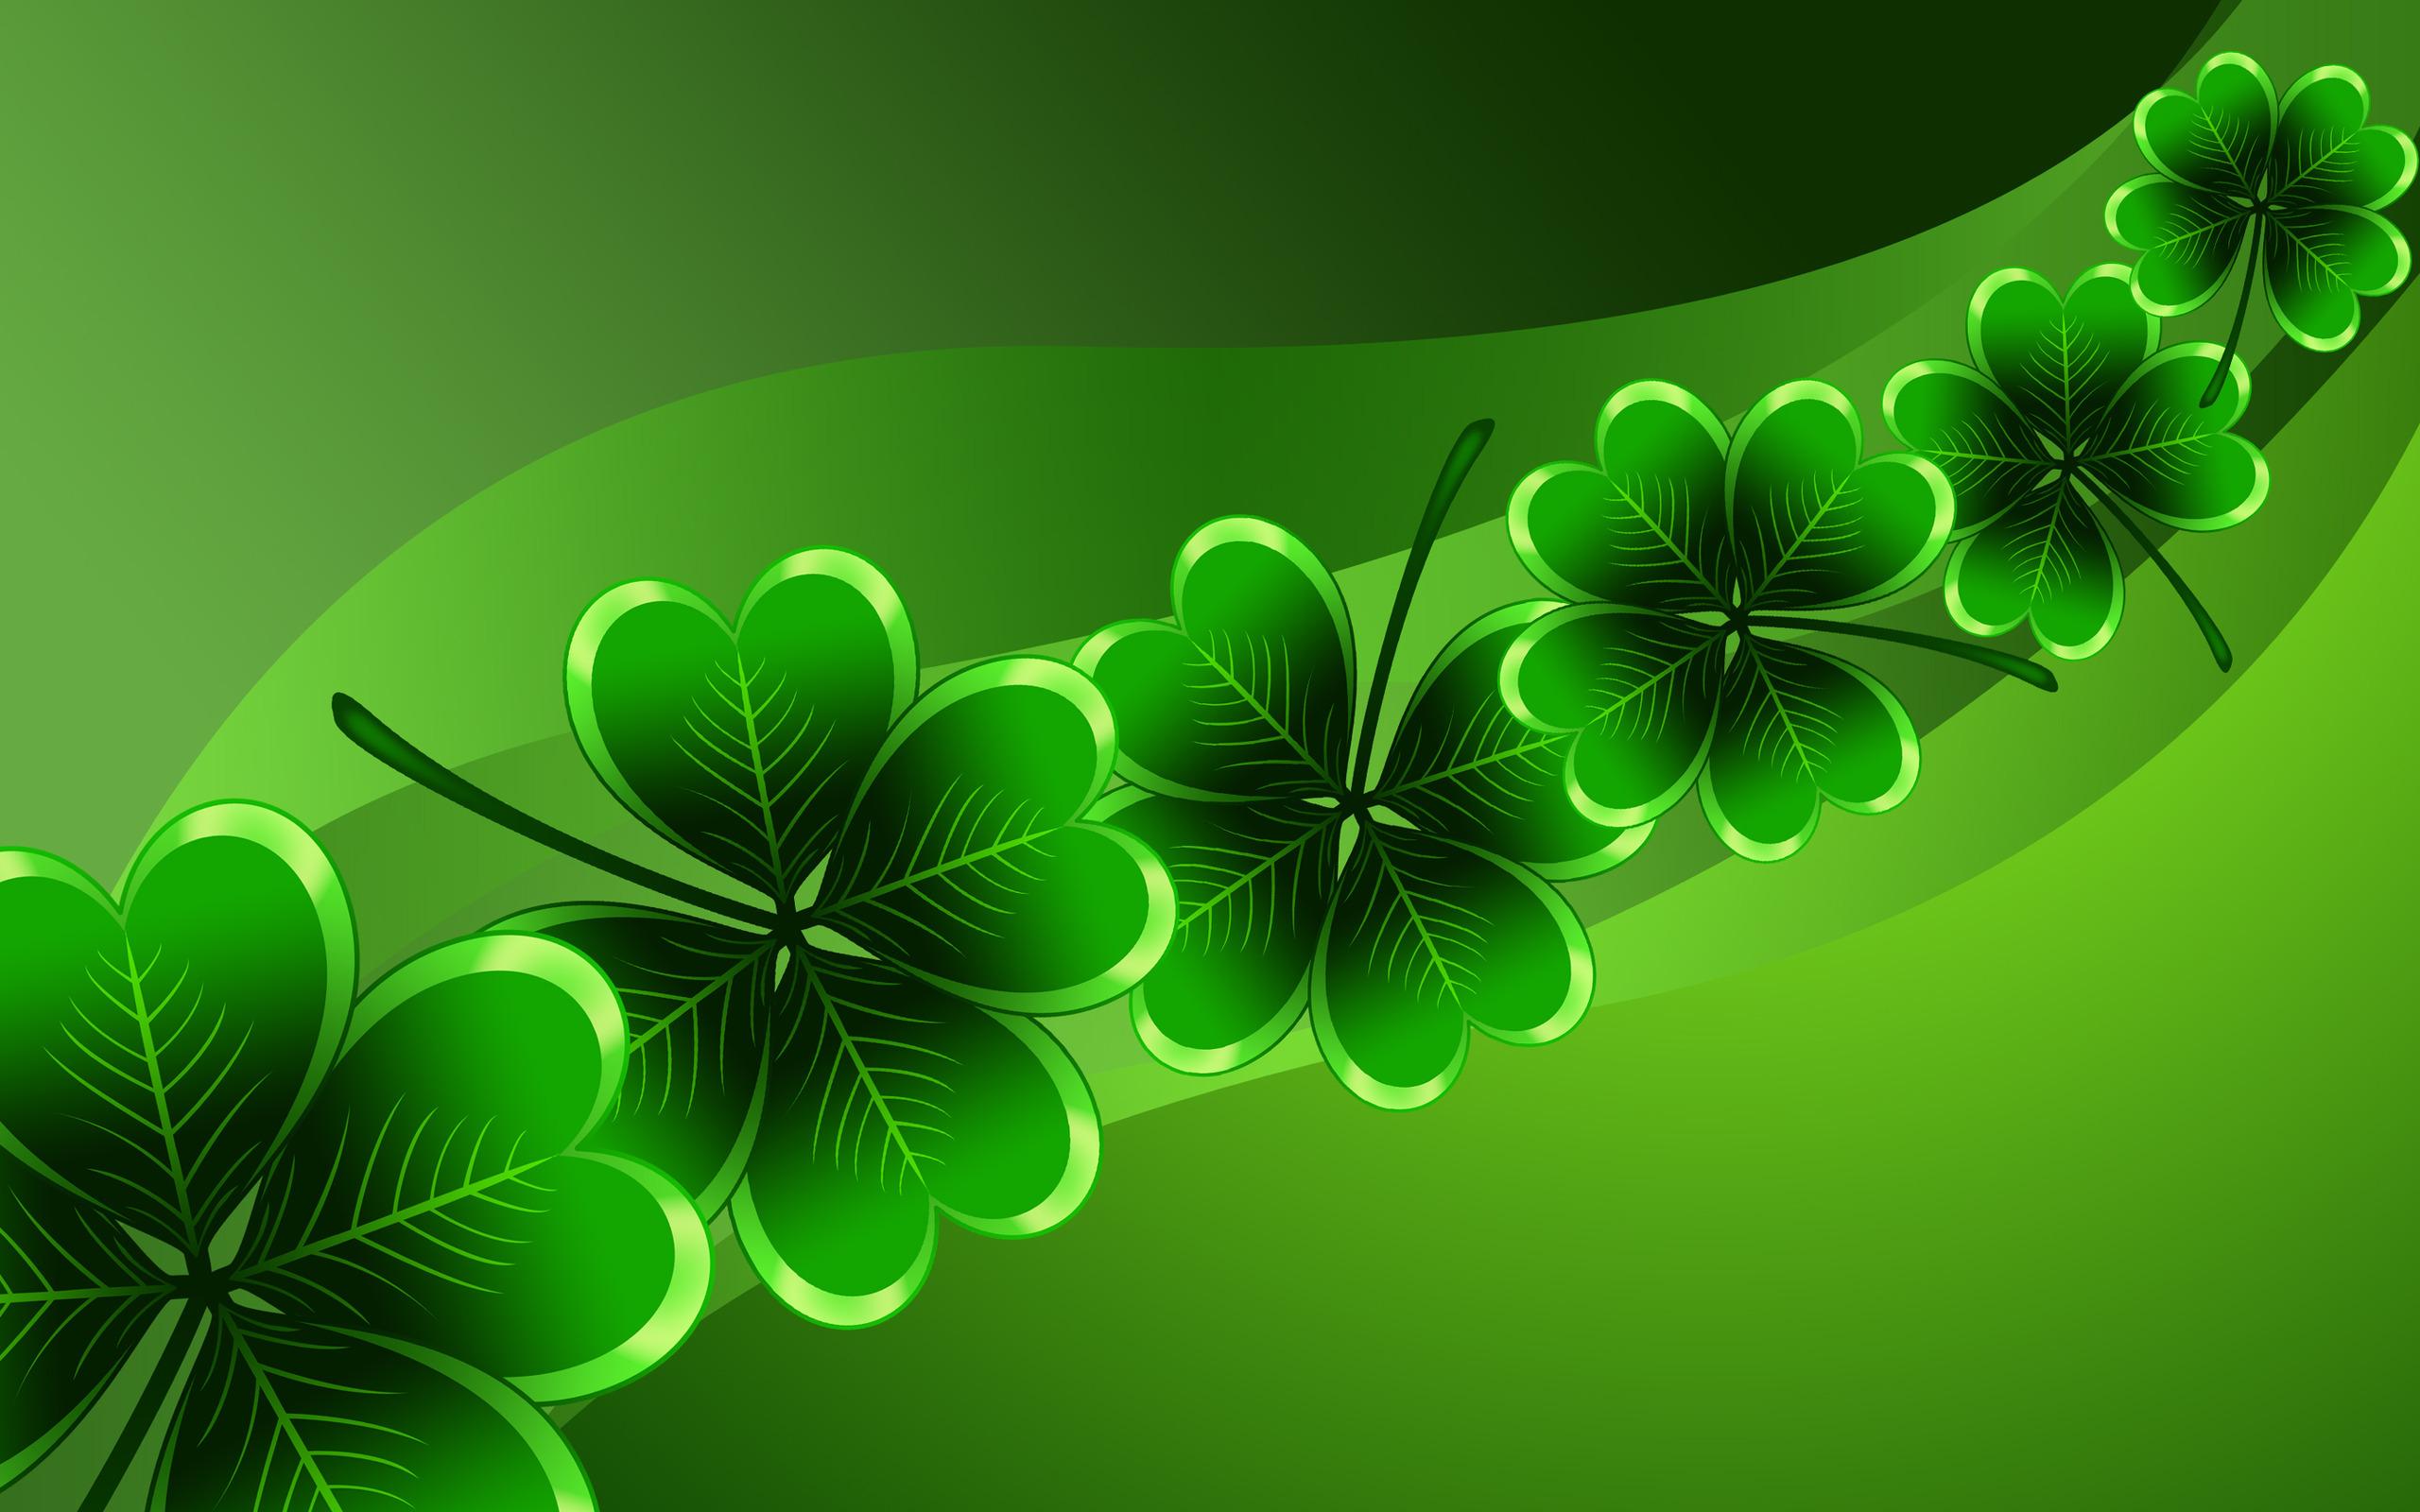 Saint Patricks Day Wallpaper 10553 2560x1600